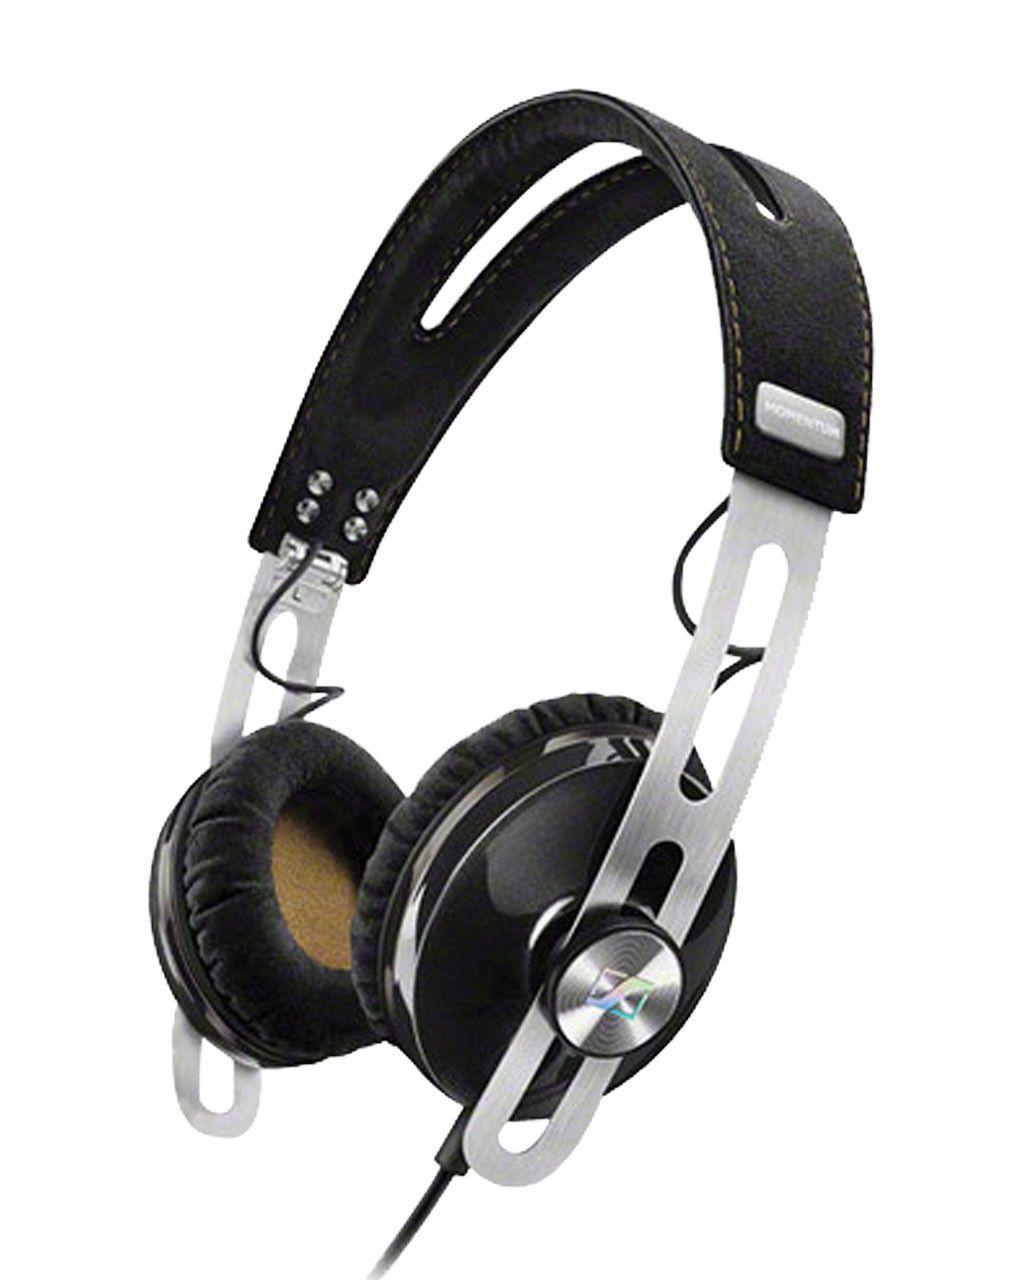 Sennheiser Momentum Wired M2 On Ear Oei Ios Headphones Sennheiser Momentum Headphones In Ear Headphones